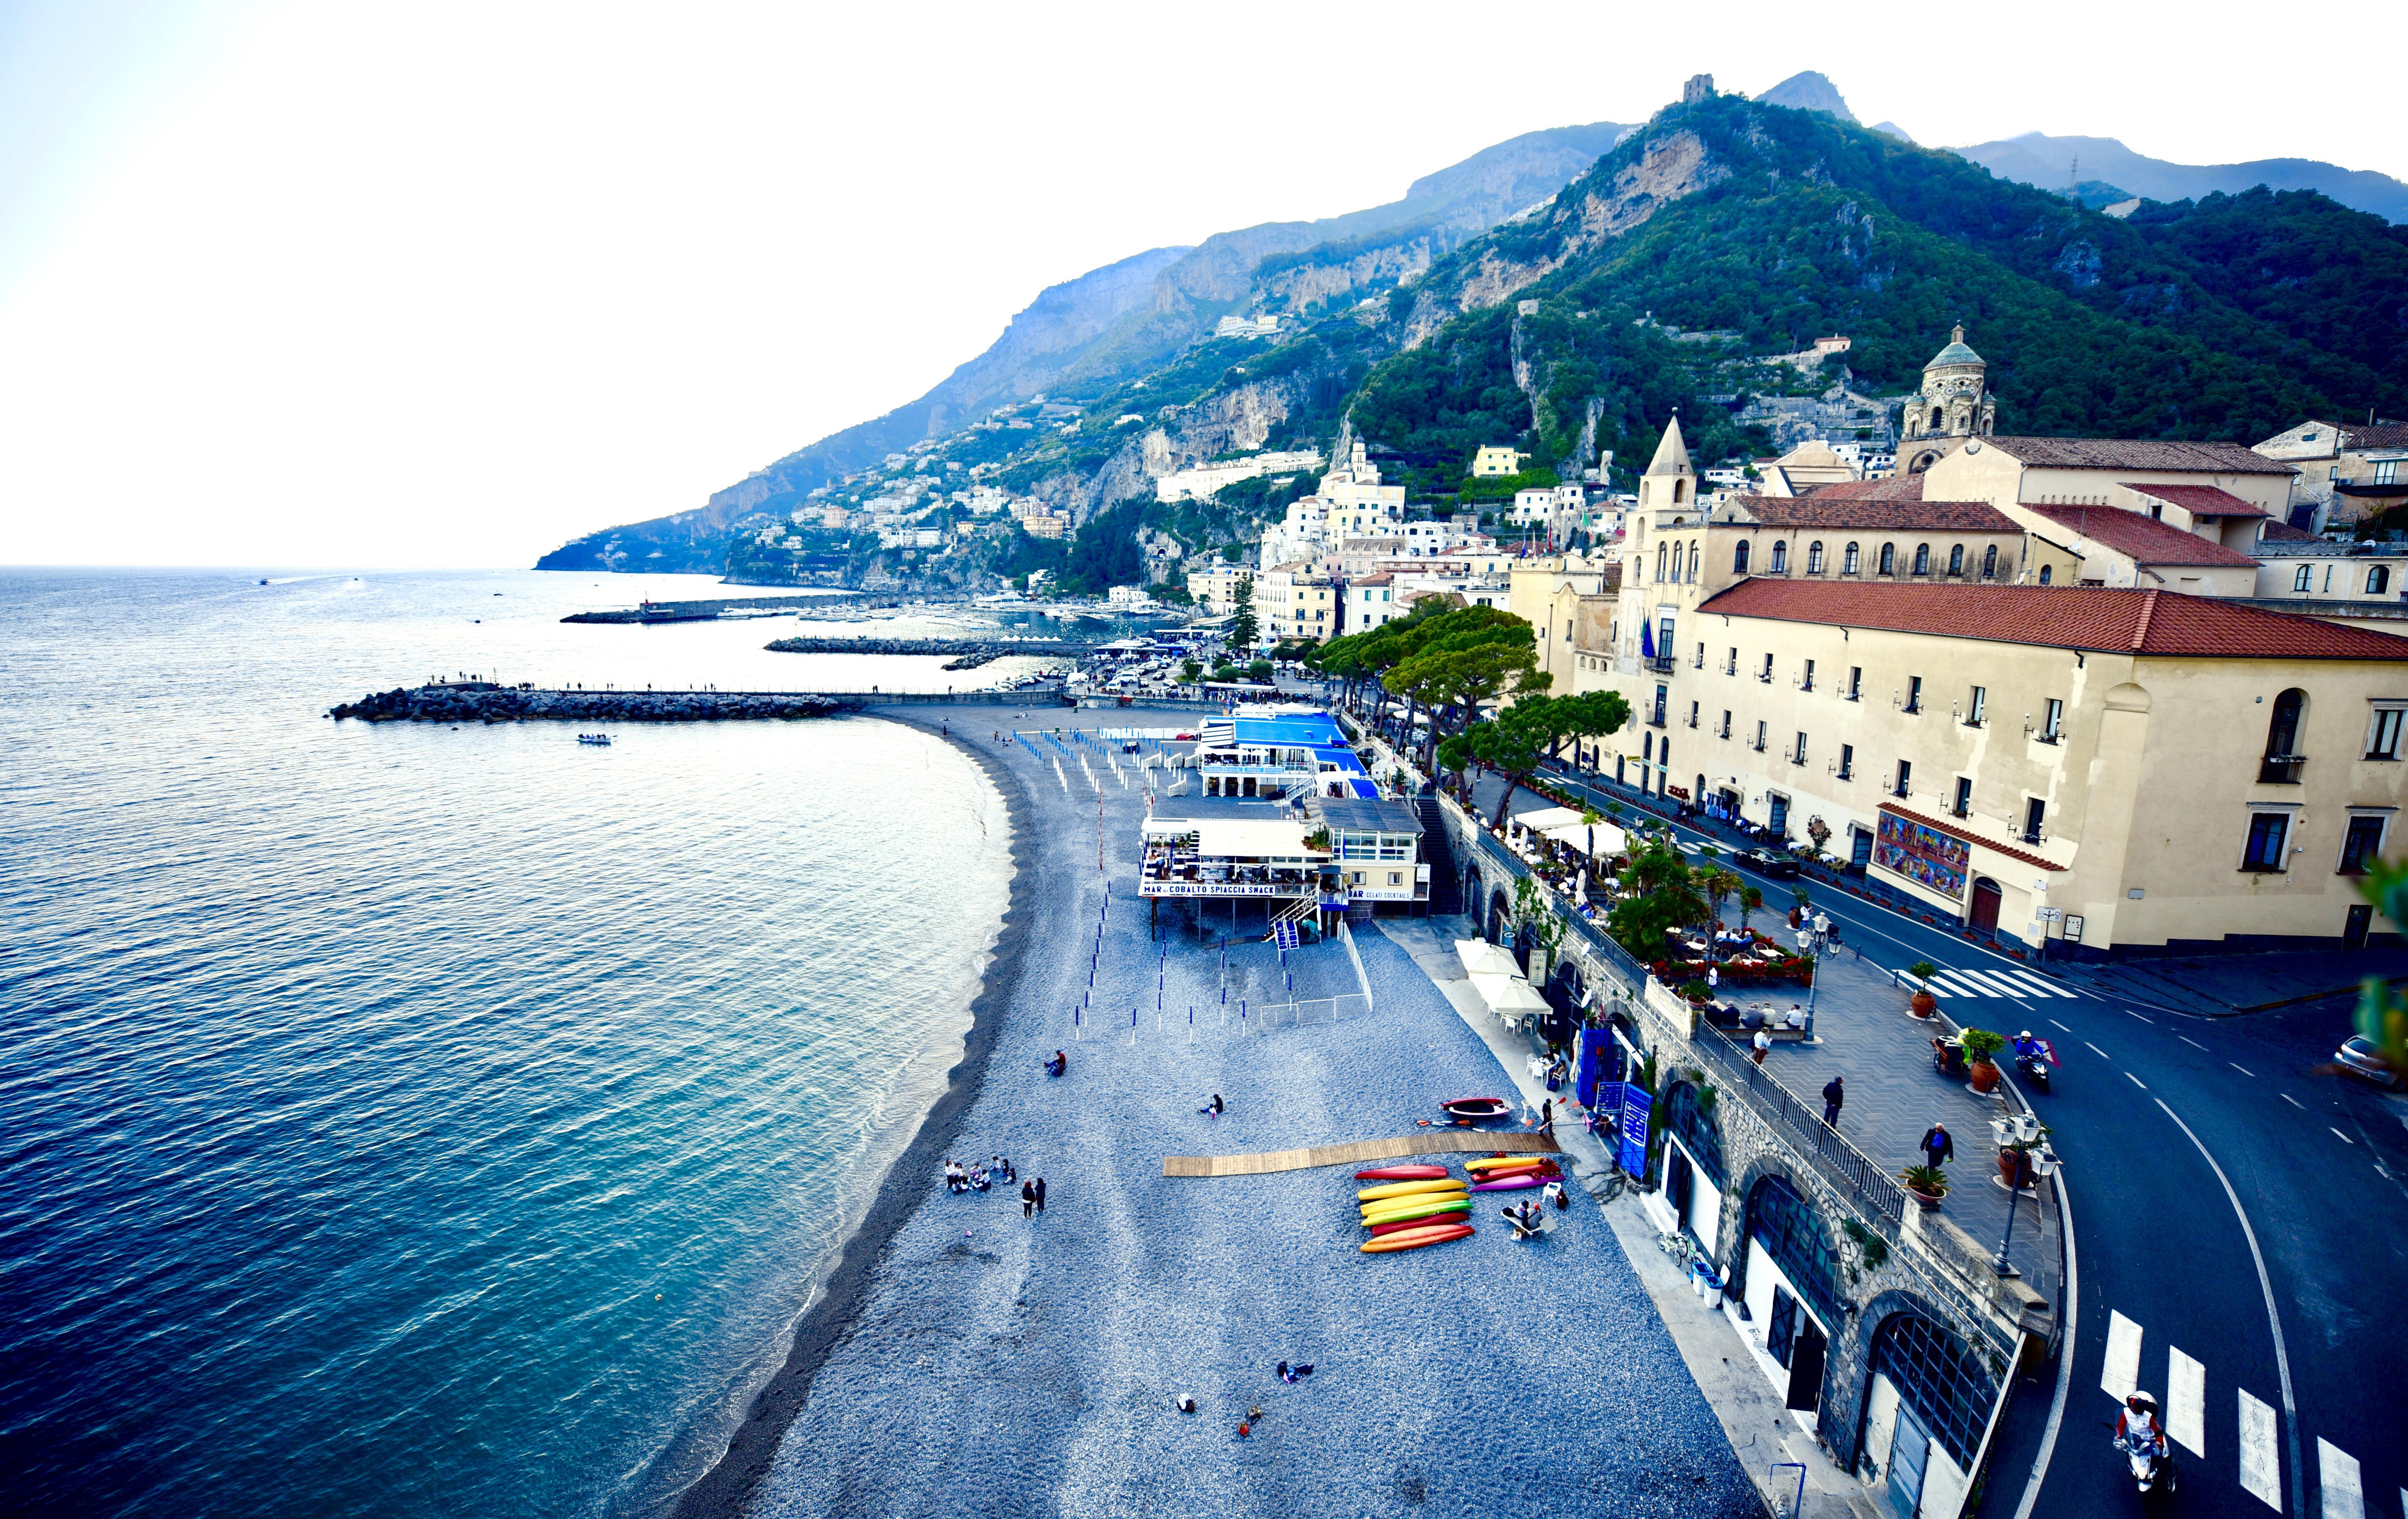 Hotel Marina Riviera Amalfi Coast Bend Road Balcony View Positano DNXB dongnanxibei